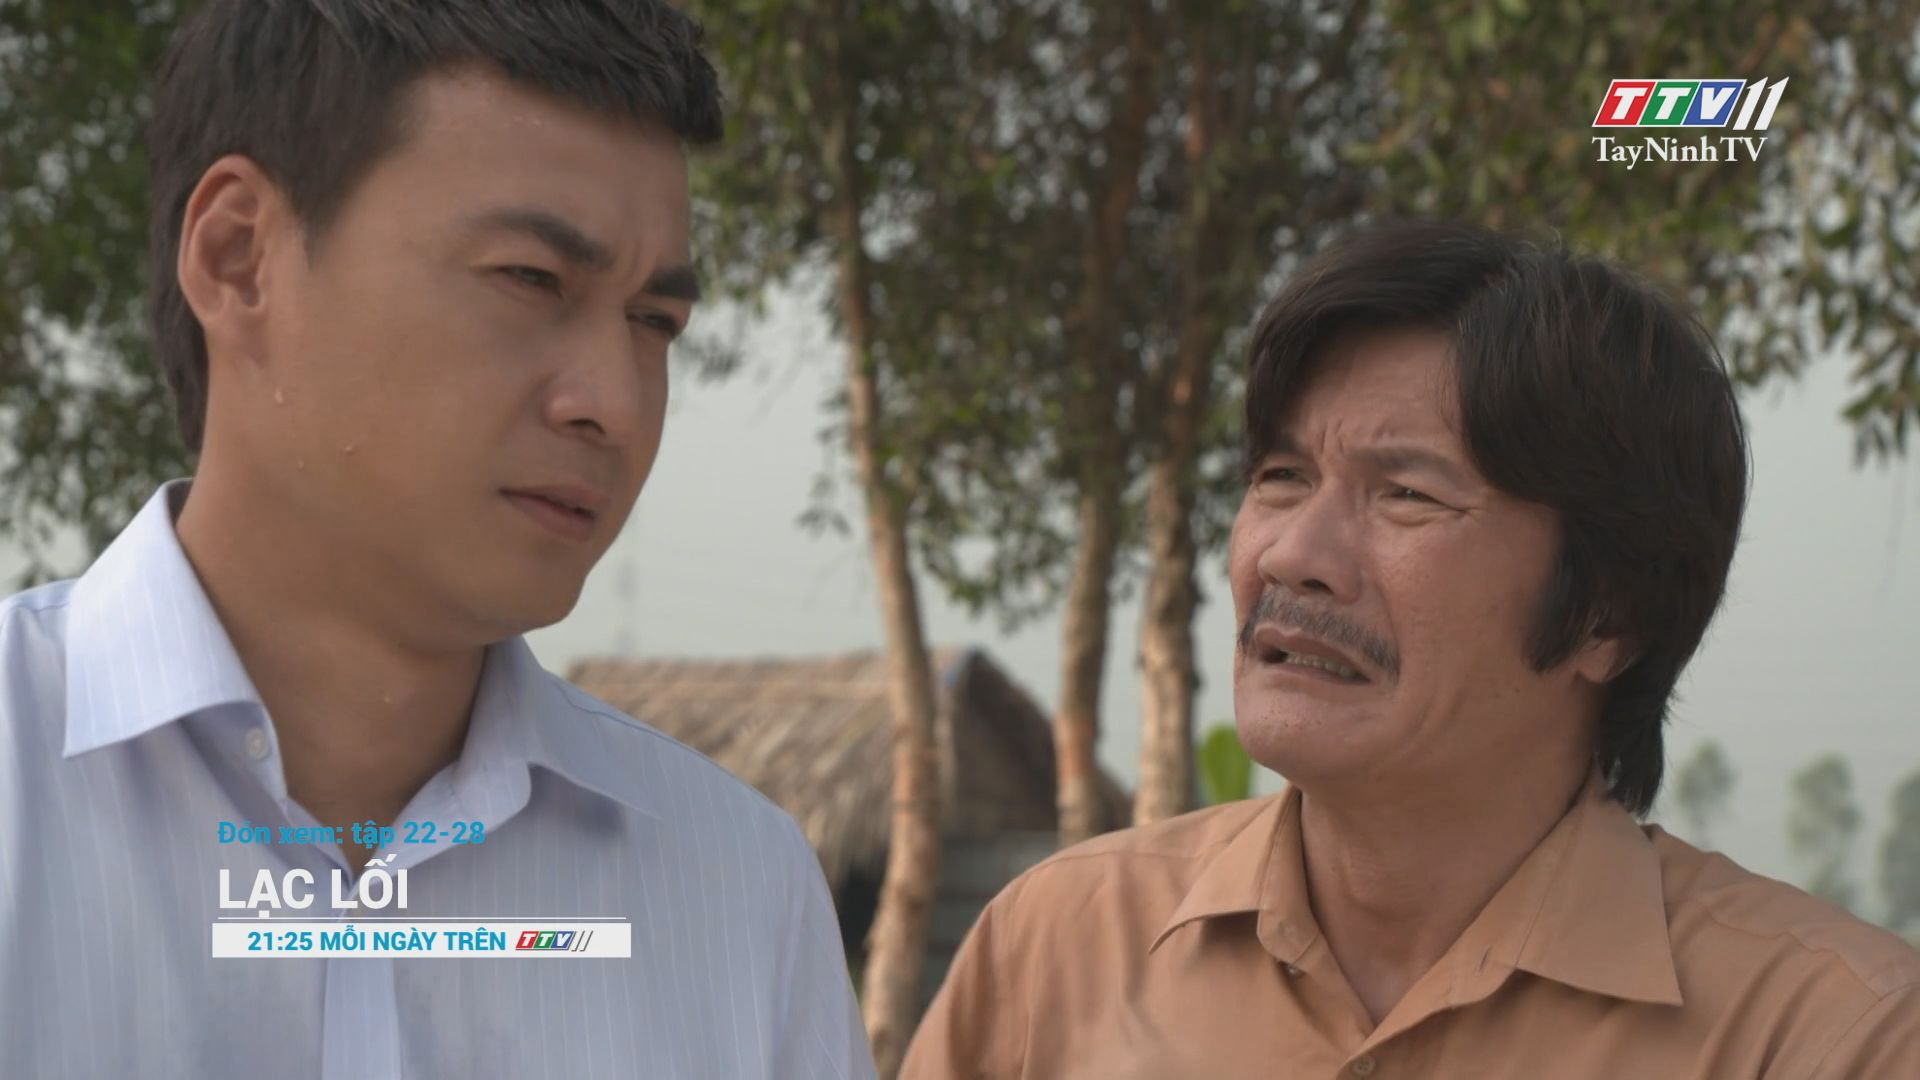 Phim LẠC LỐI - Trailer | GIỚI THIỆU PHIM | TayNinhTV